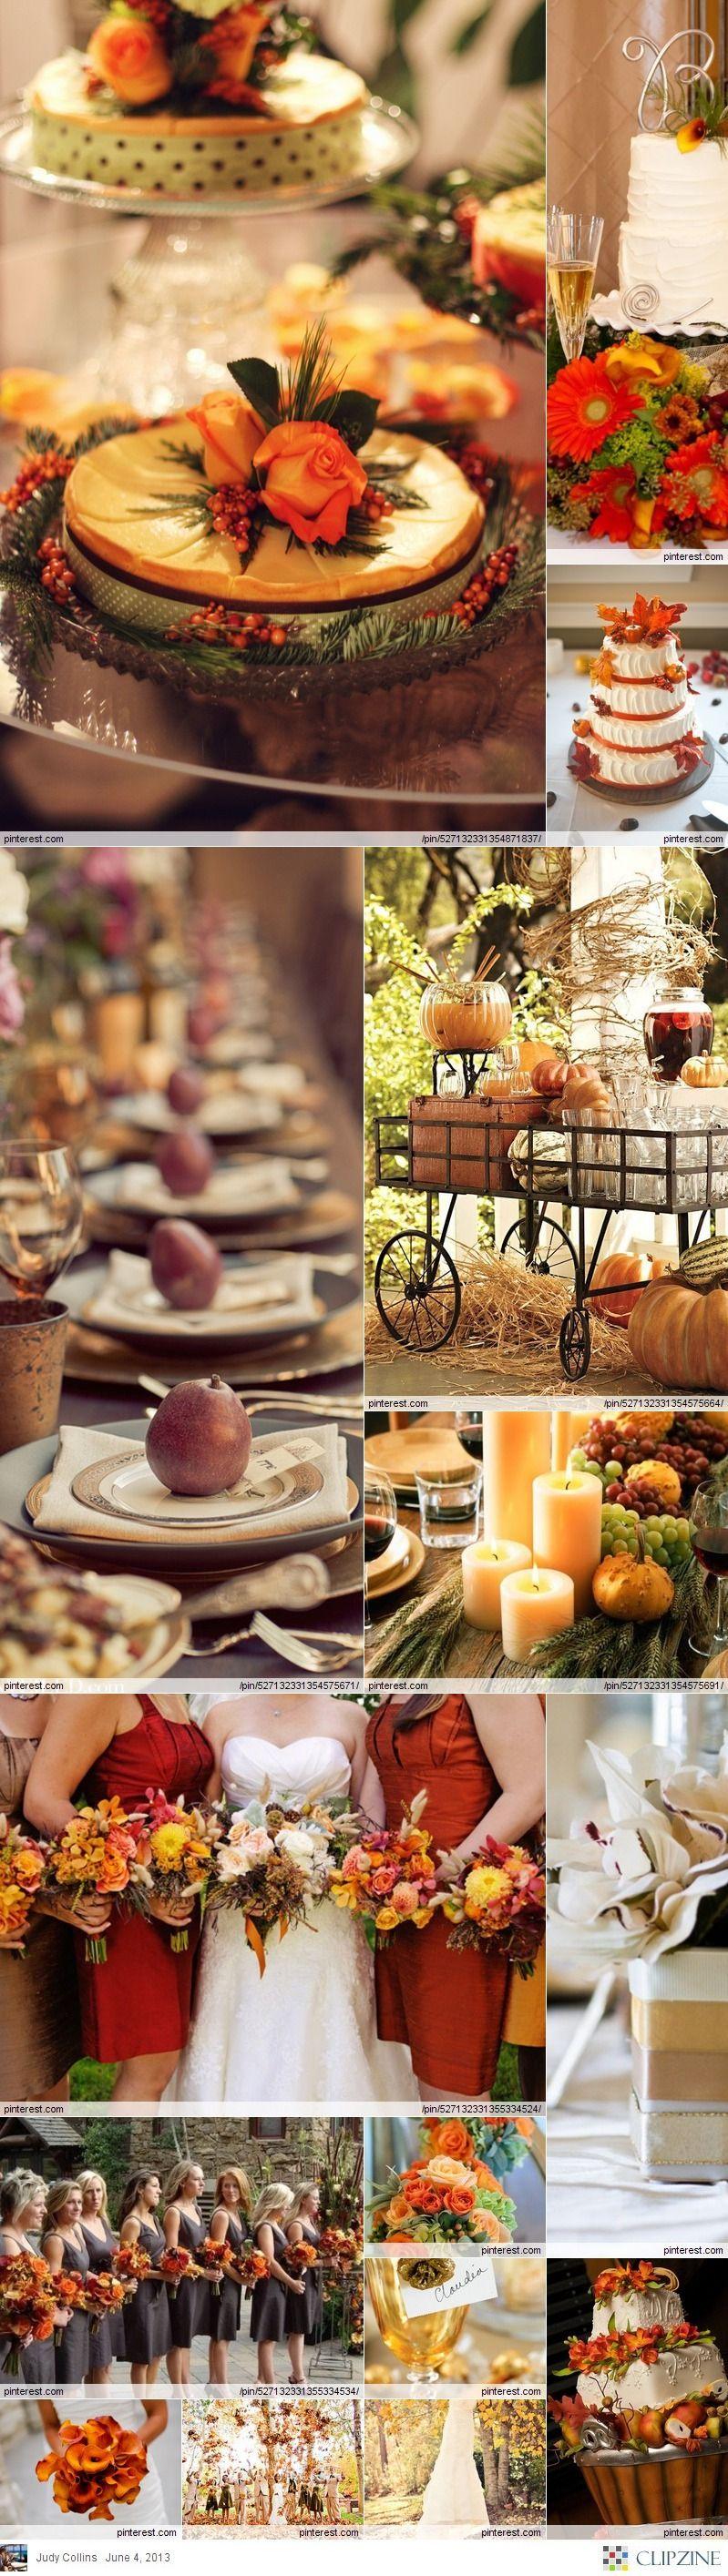 Autumn Weddings Wedding Inspiration Fall Autumn Wedding Fall Wedding